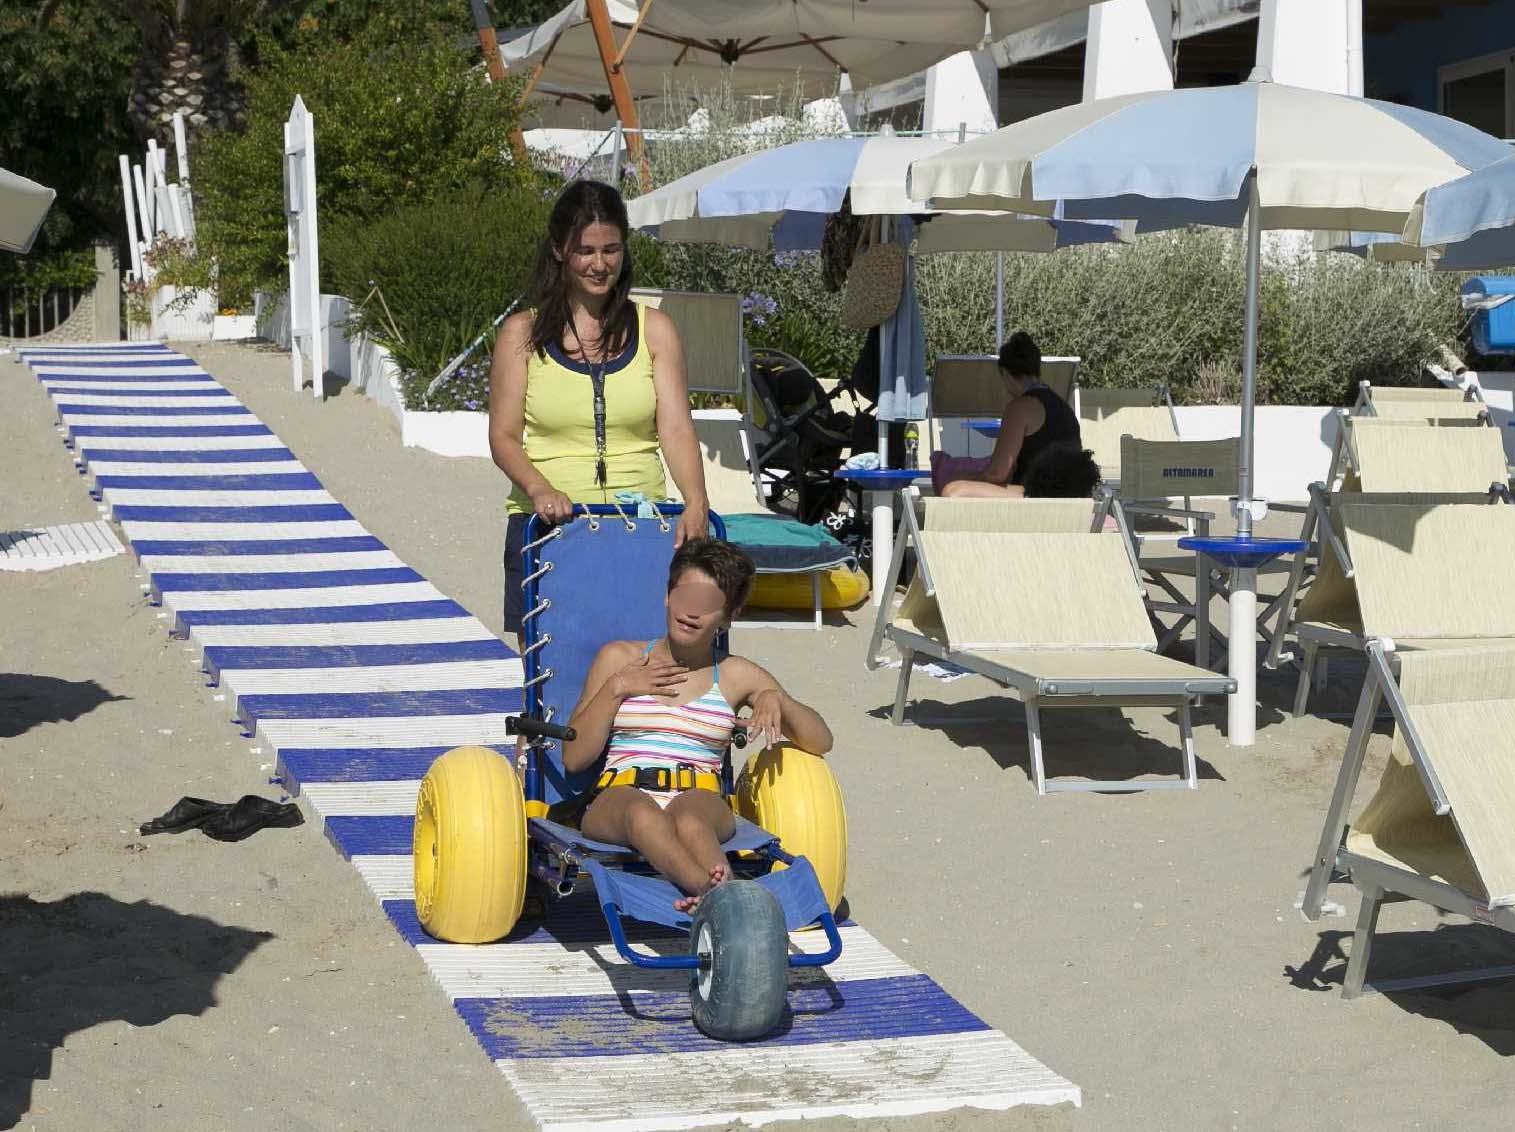 Puglia la regione regala le sedie per disabili ai balneari